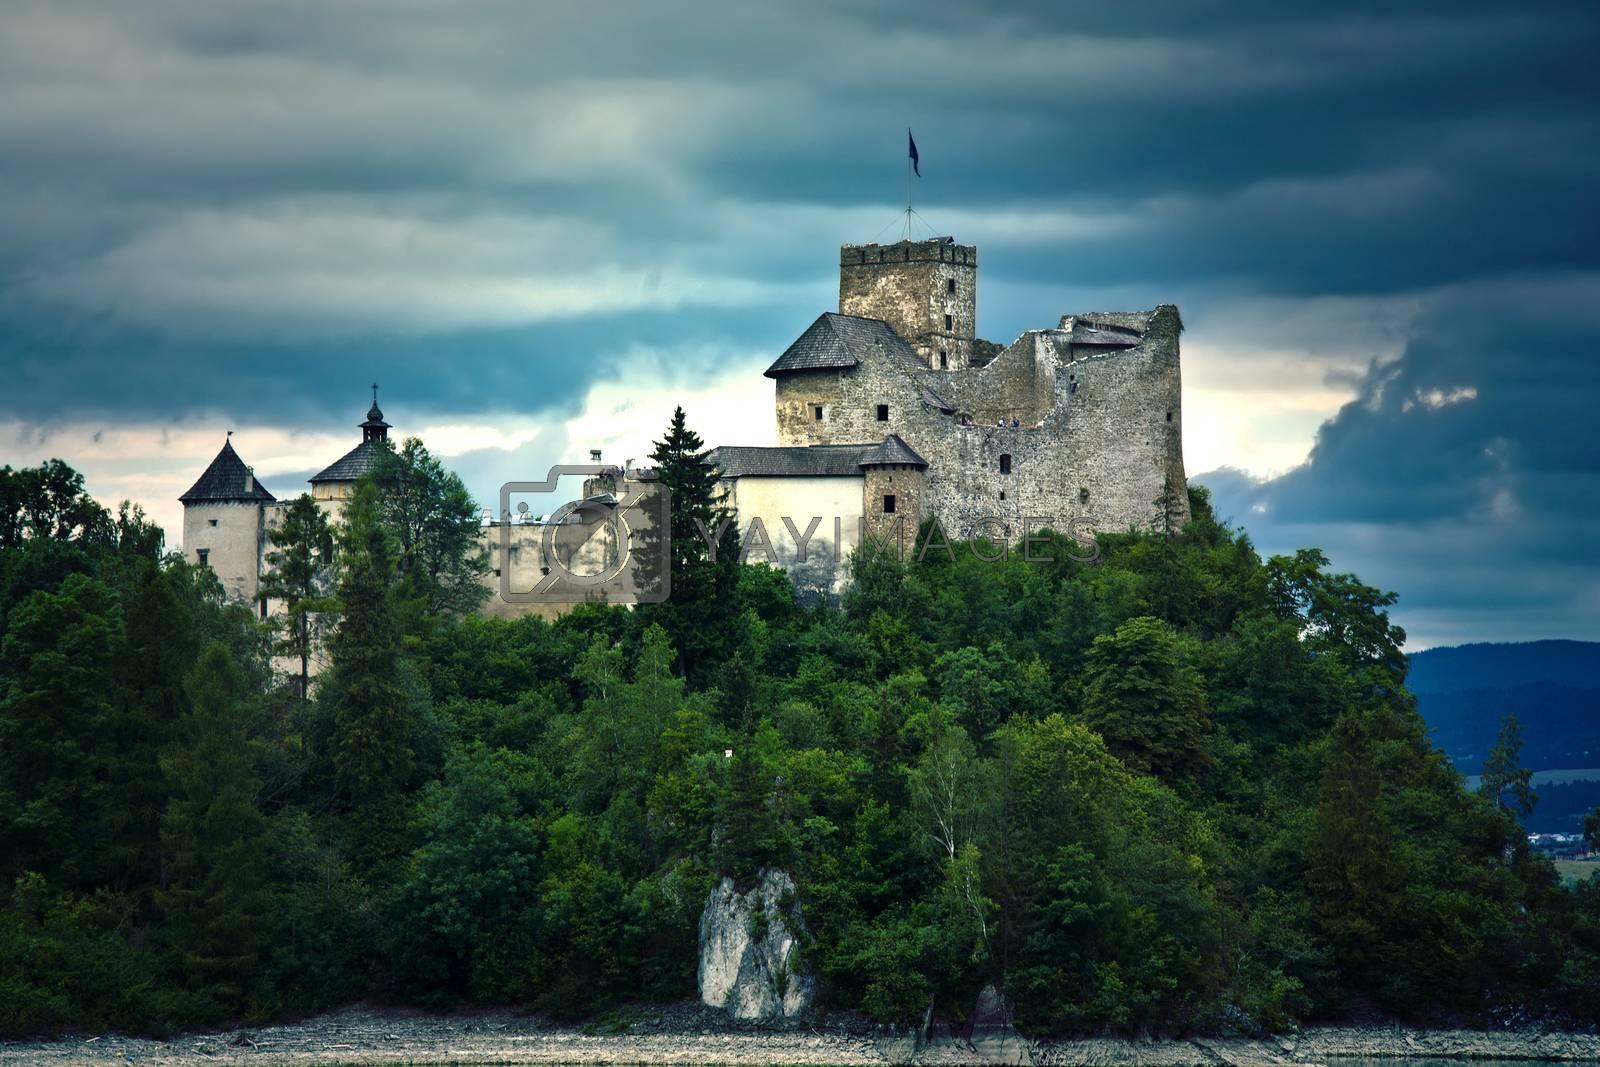 Old castle in the mountians. Castle in Niedzica, Poland.